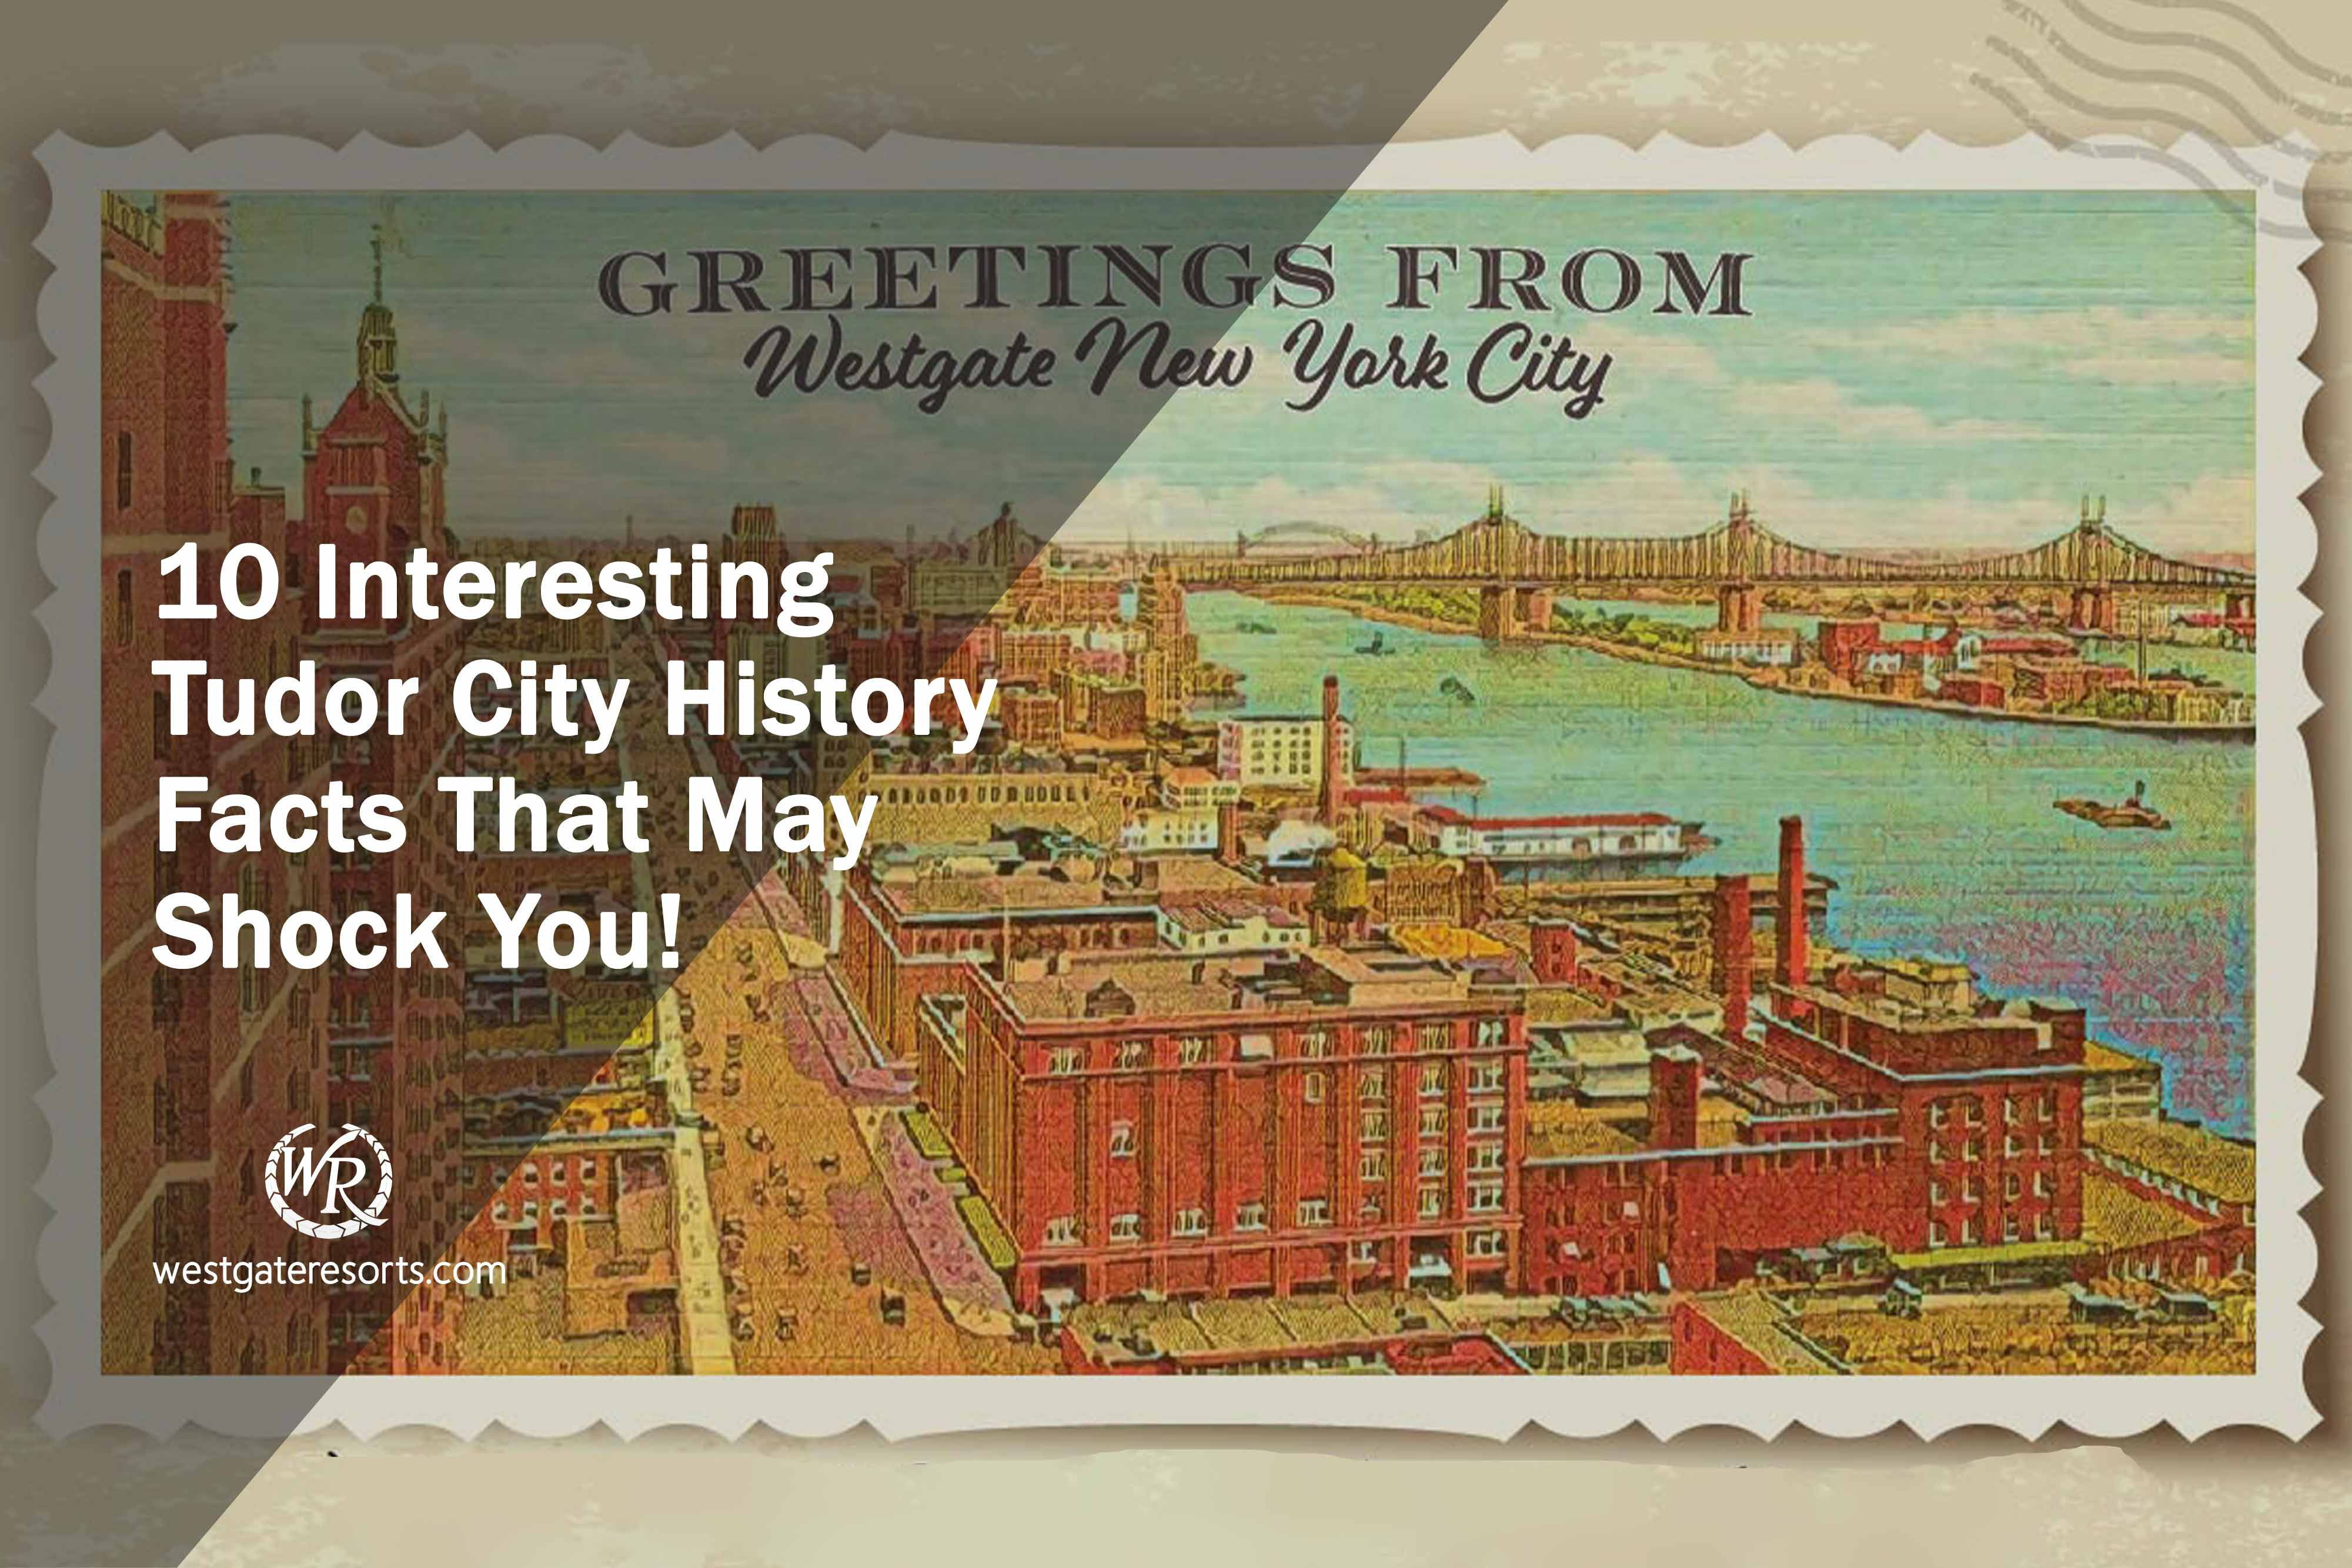 10 Interesting Tudor City History Facts That May Shock You!